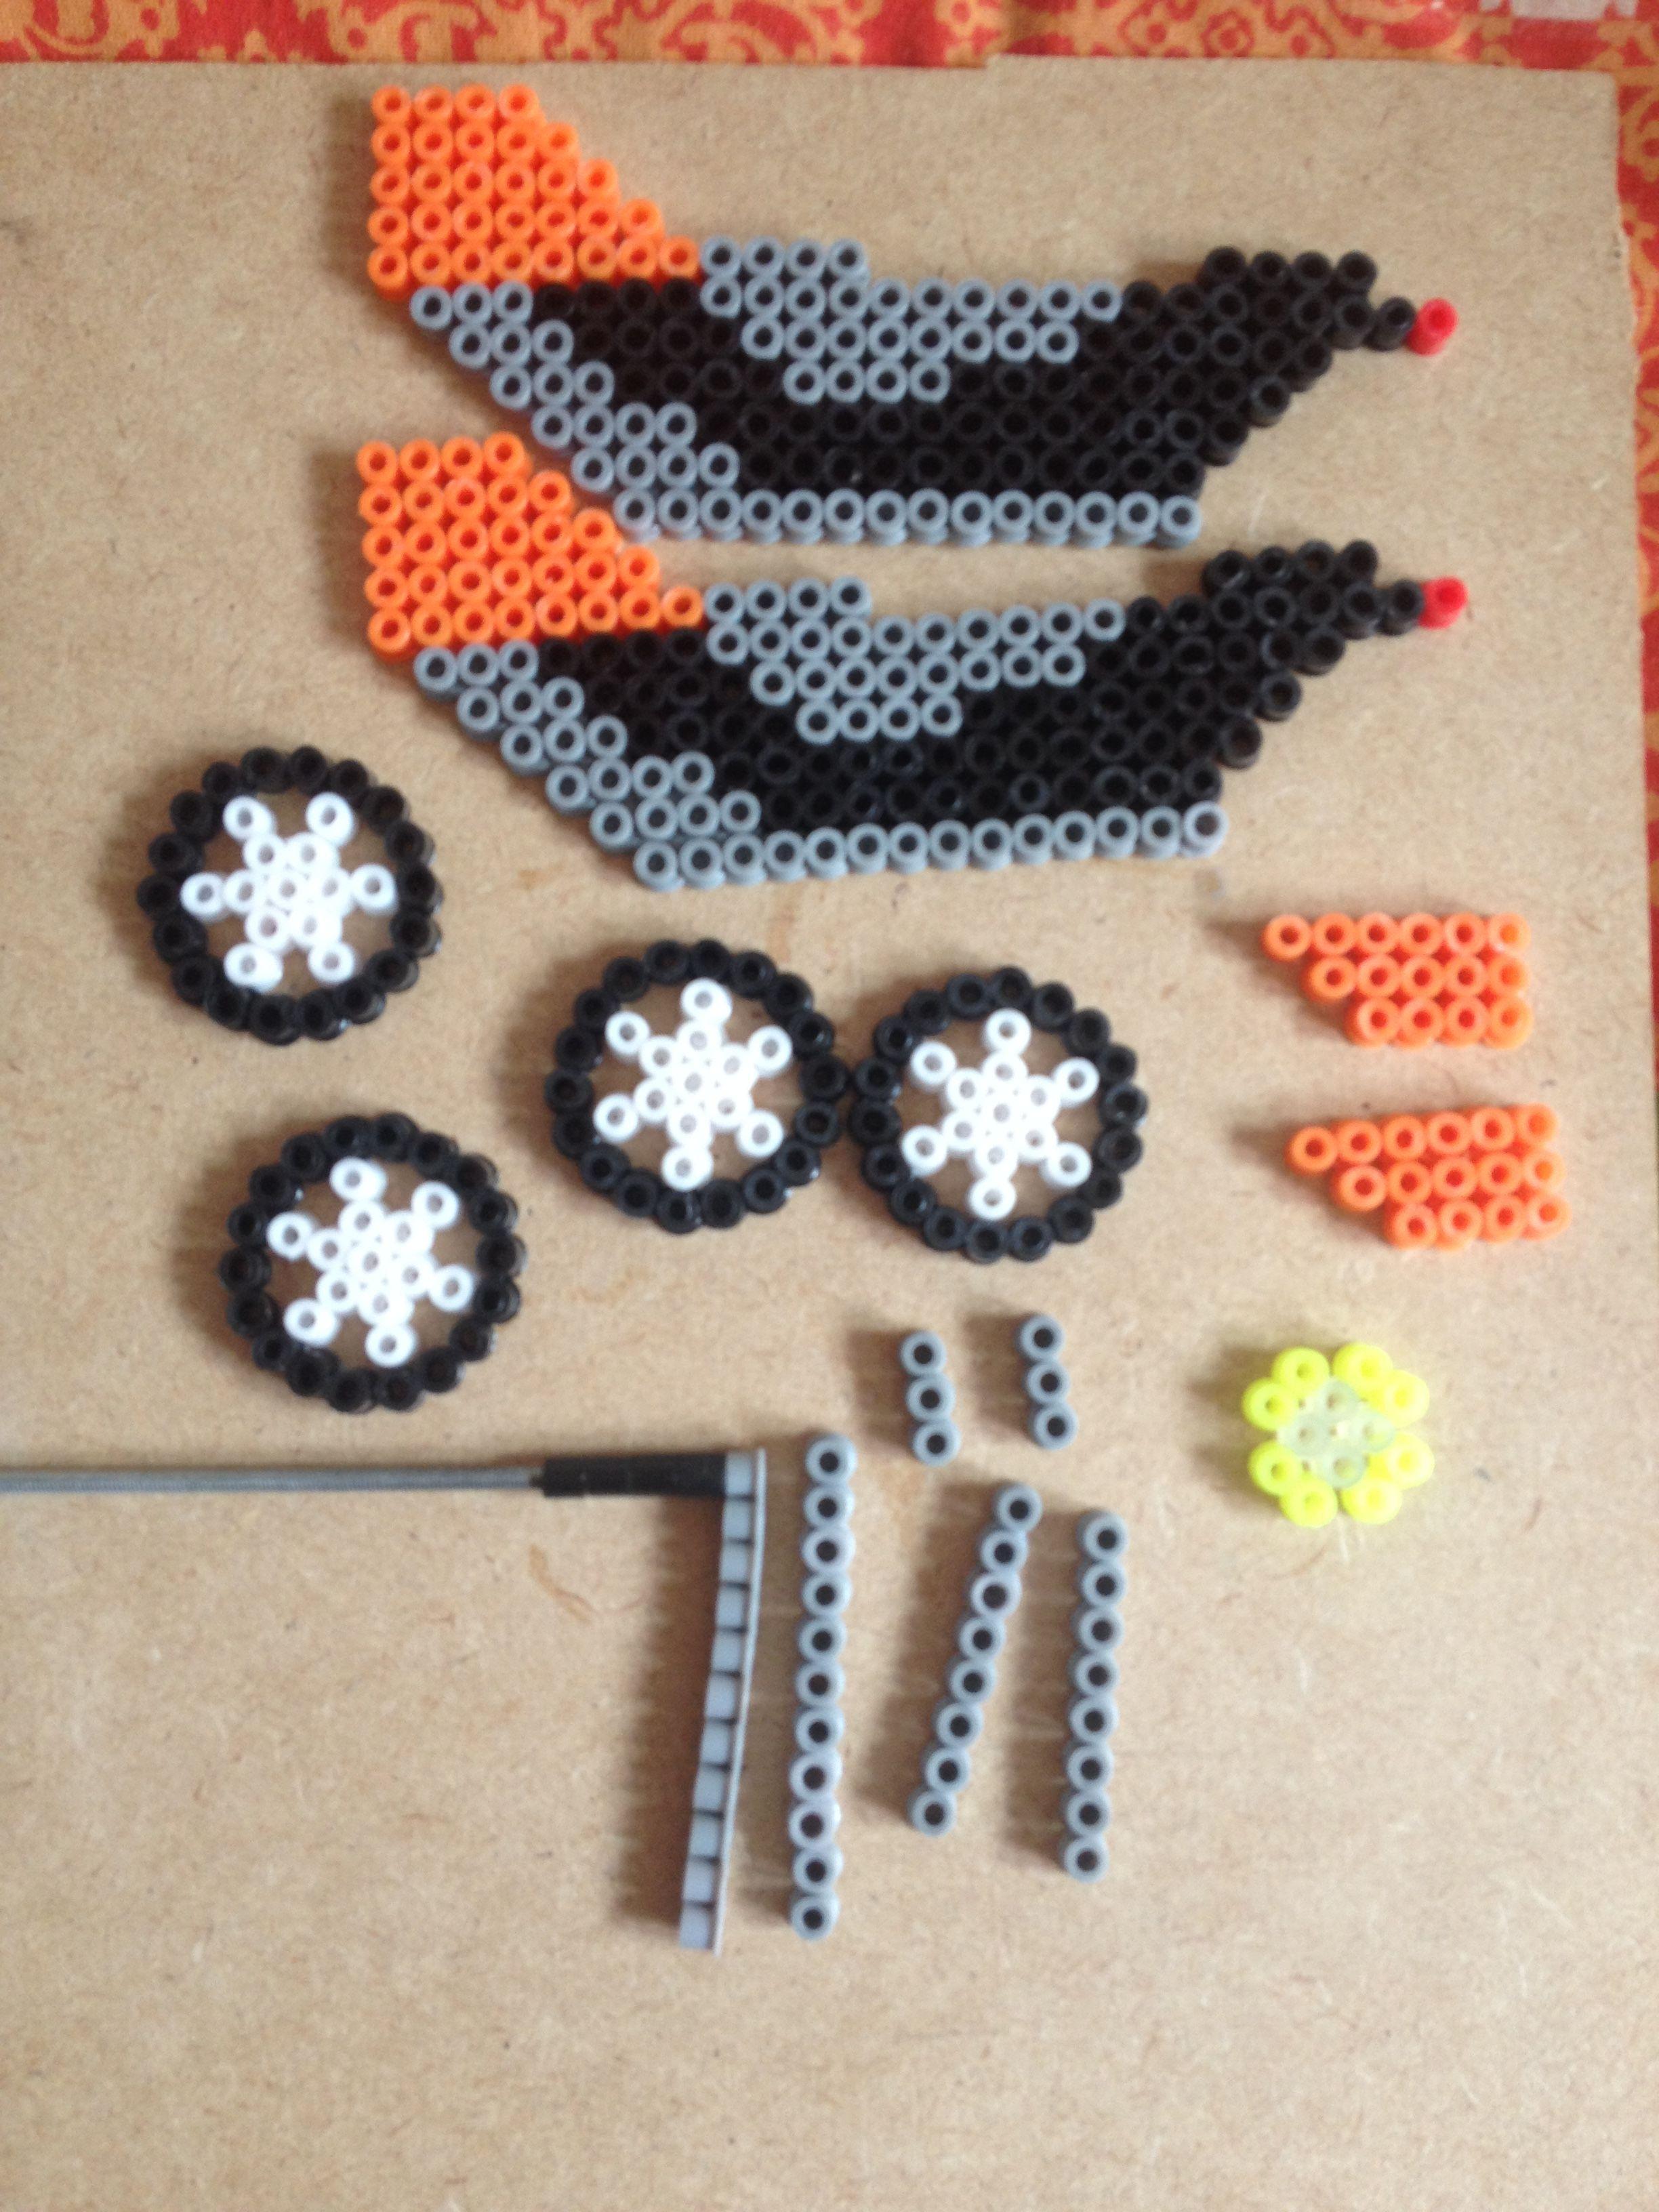 plantilla de la moto de trial perles hama pinterest perles hama hama et perles repasser. Black Bedroom Furniture Sets. Home Design Ideas